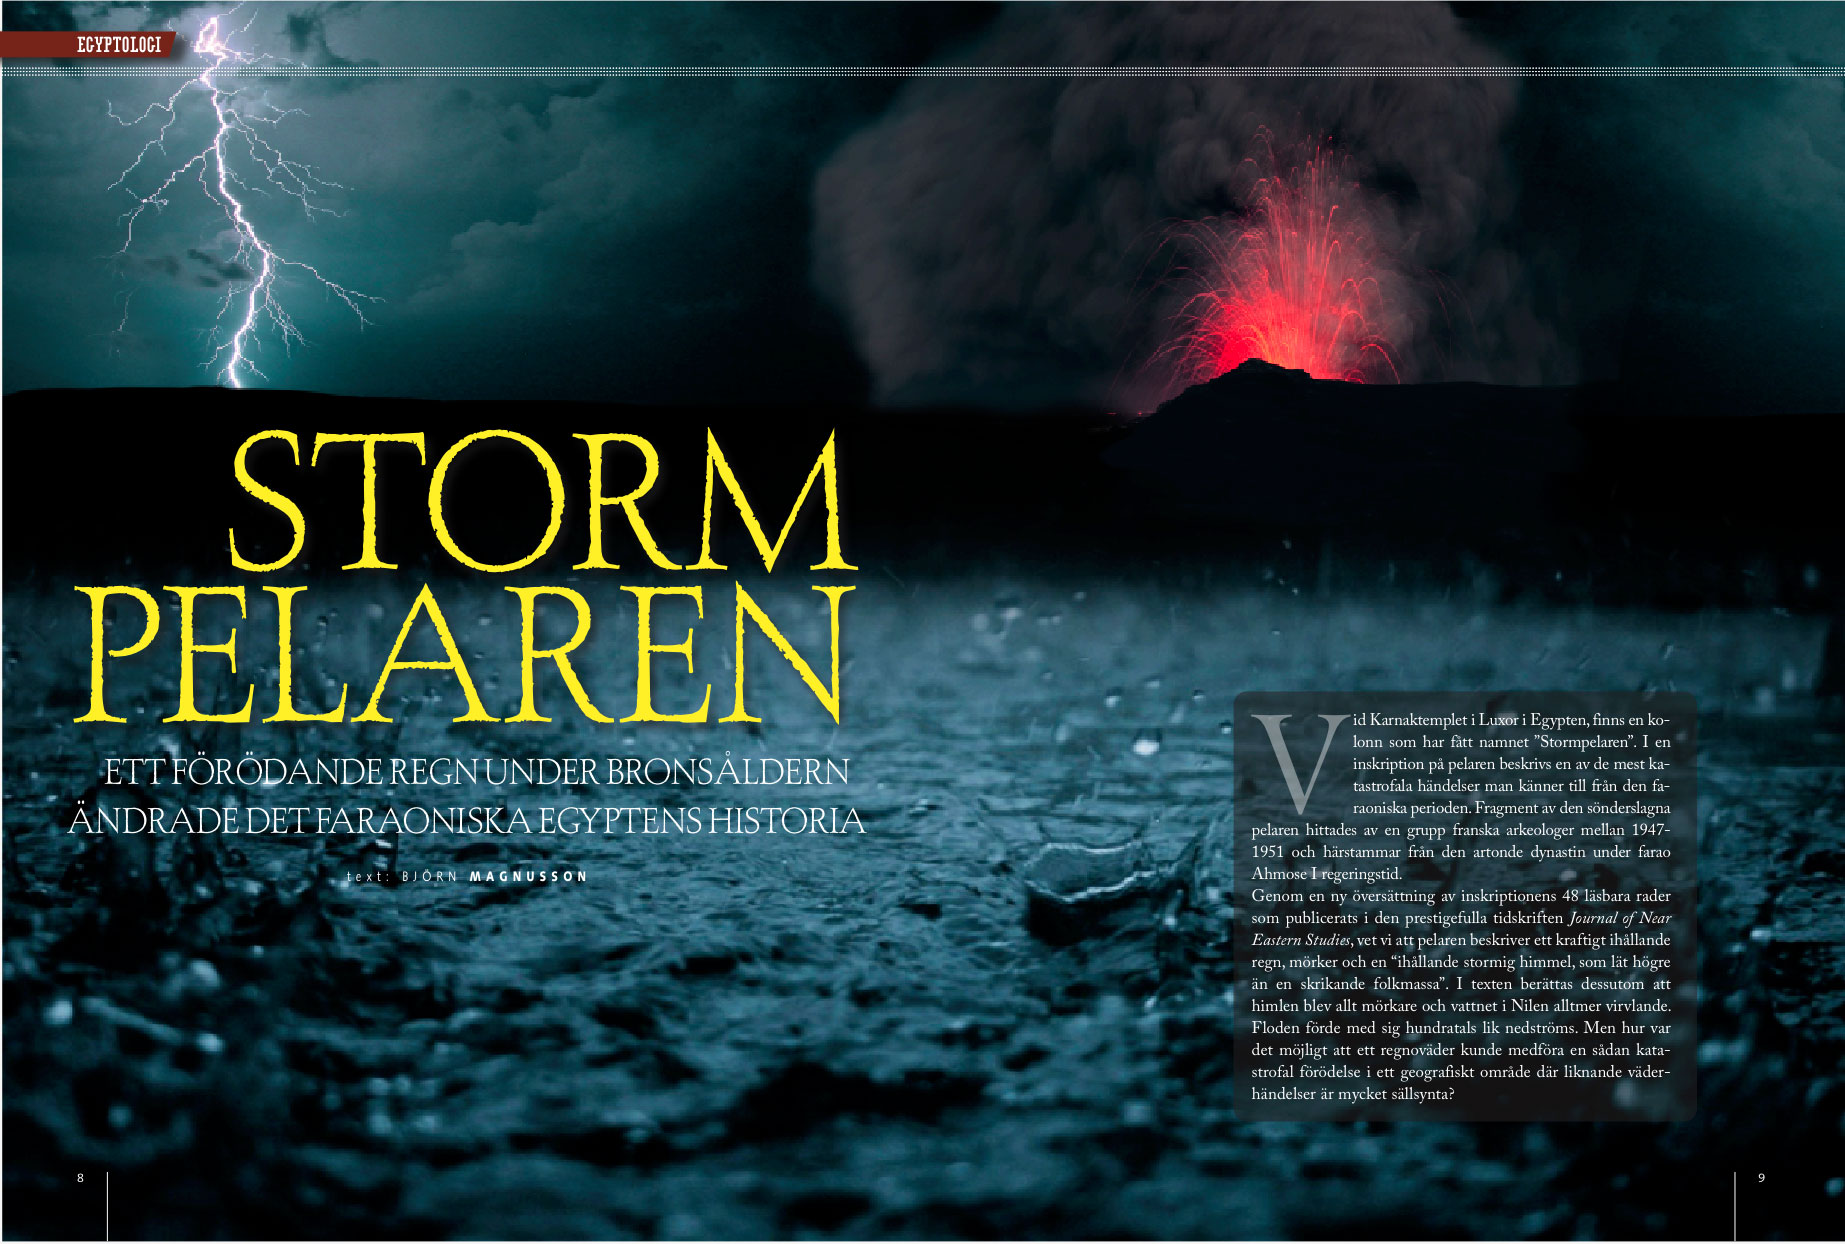 Stormpelaren.jpg